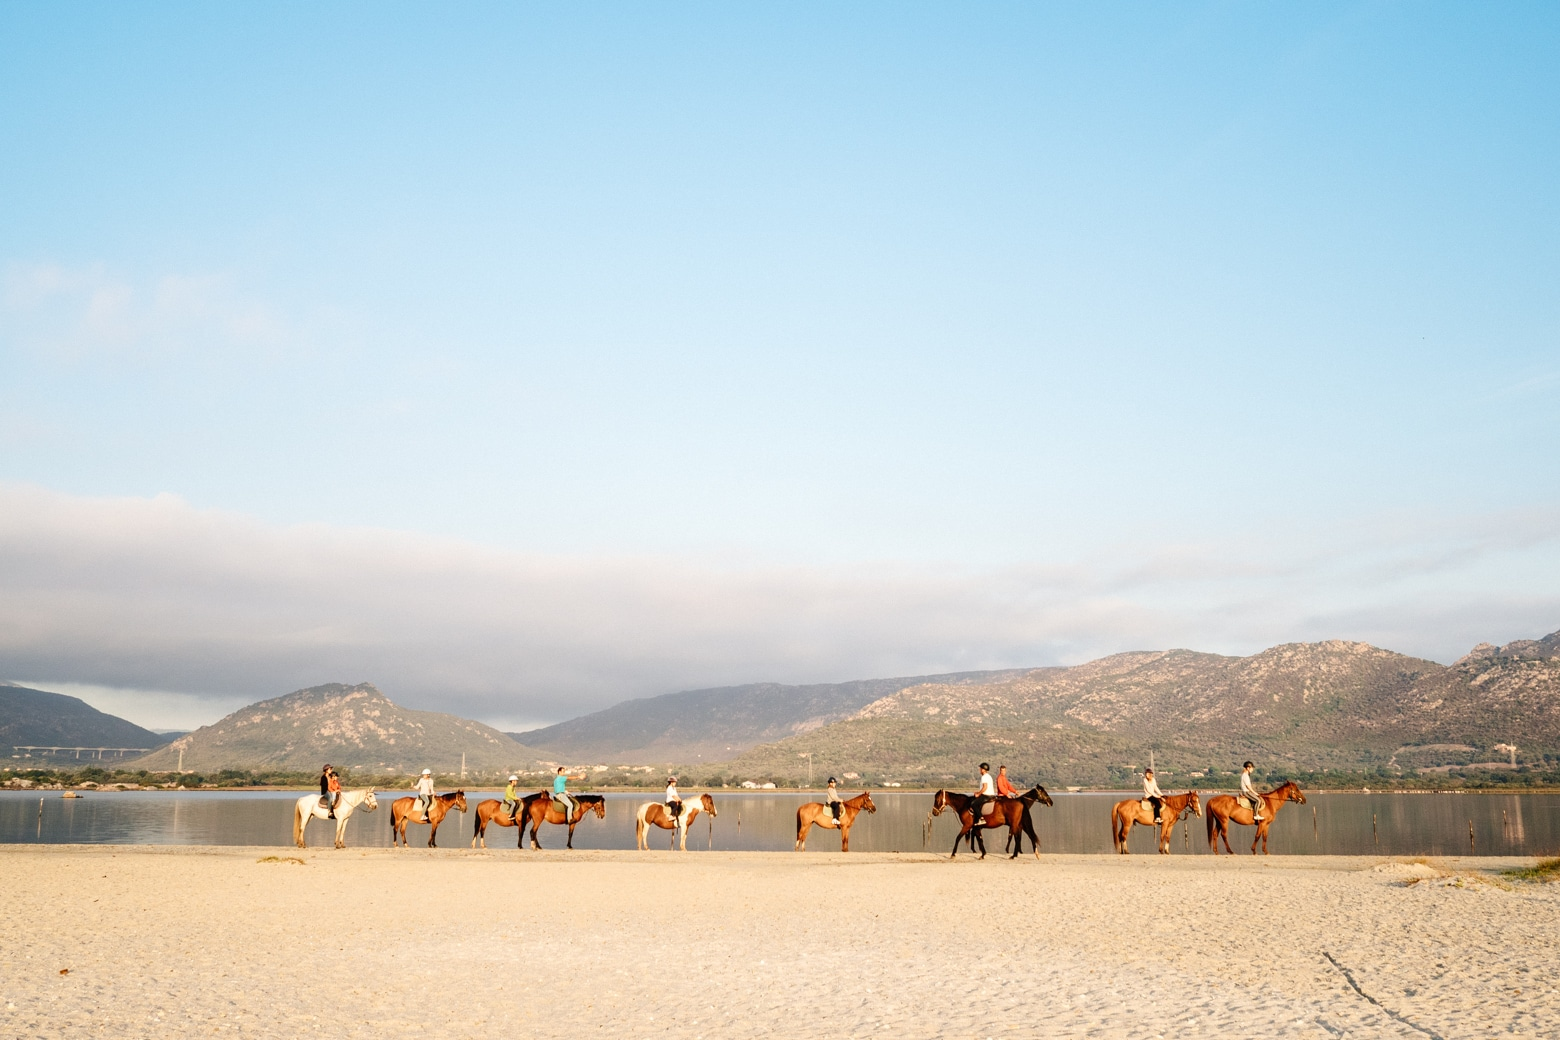 Beach Horse Riding at La Cinta